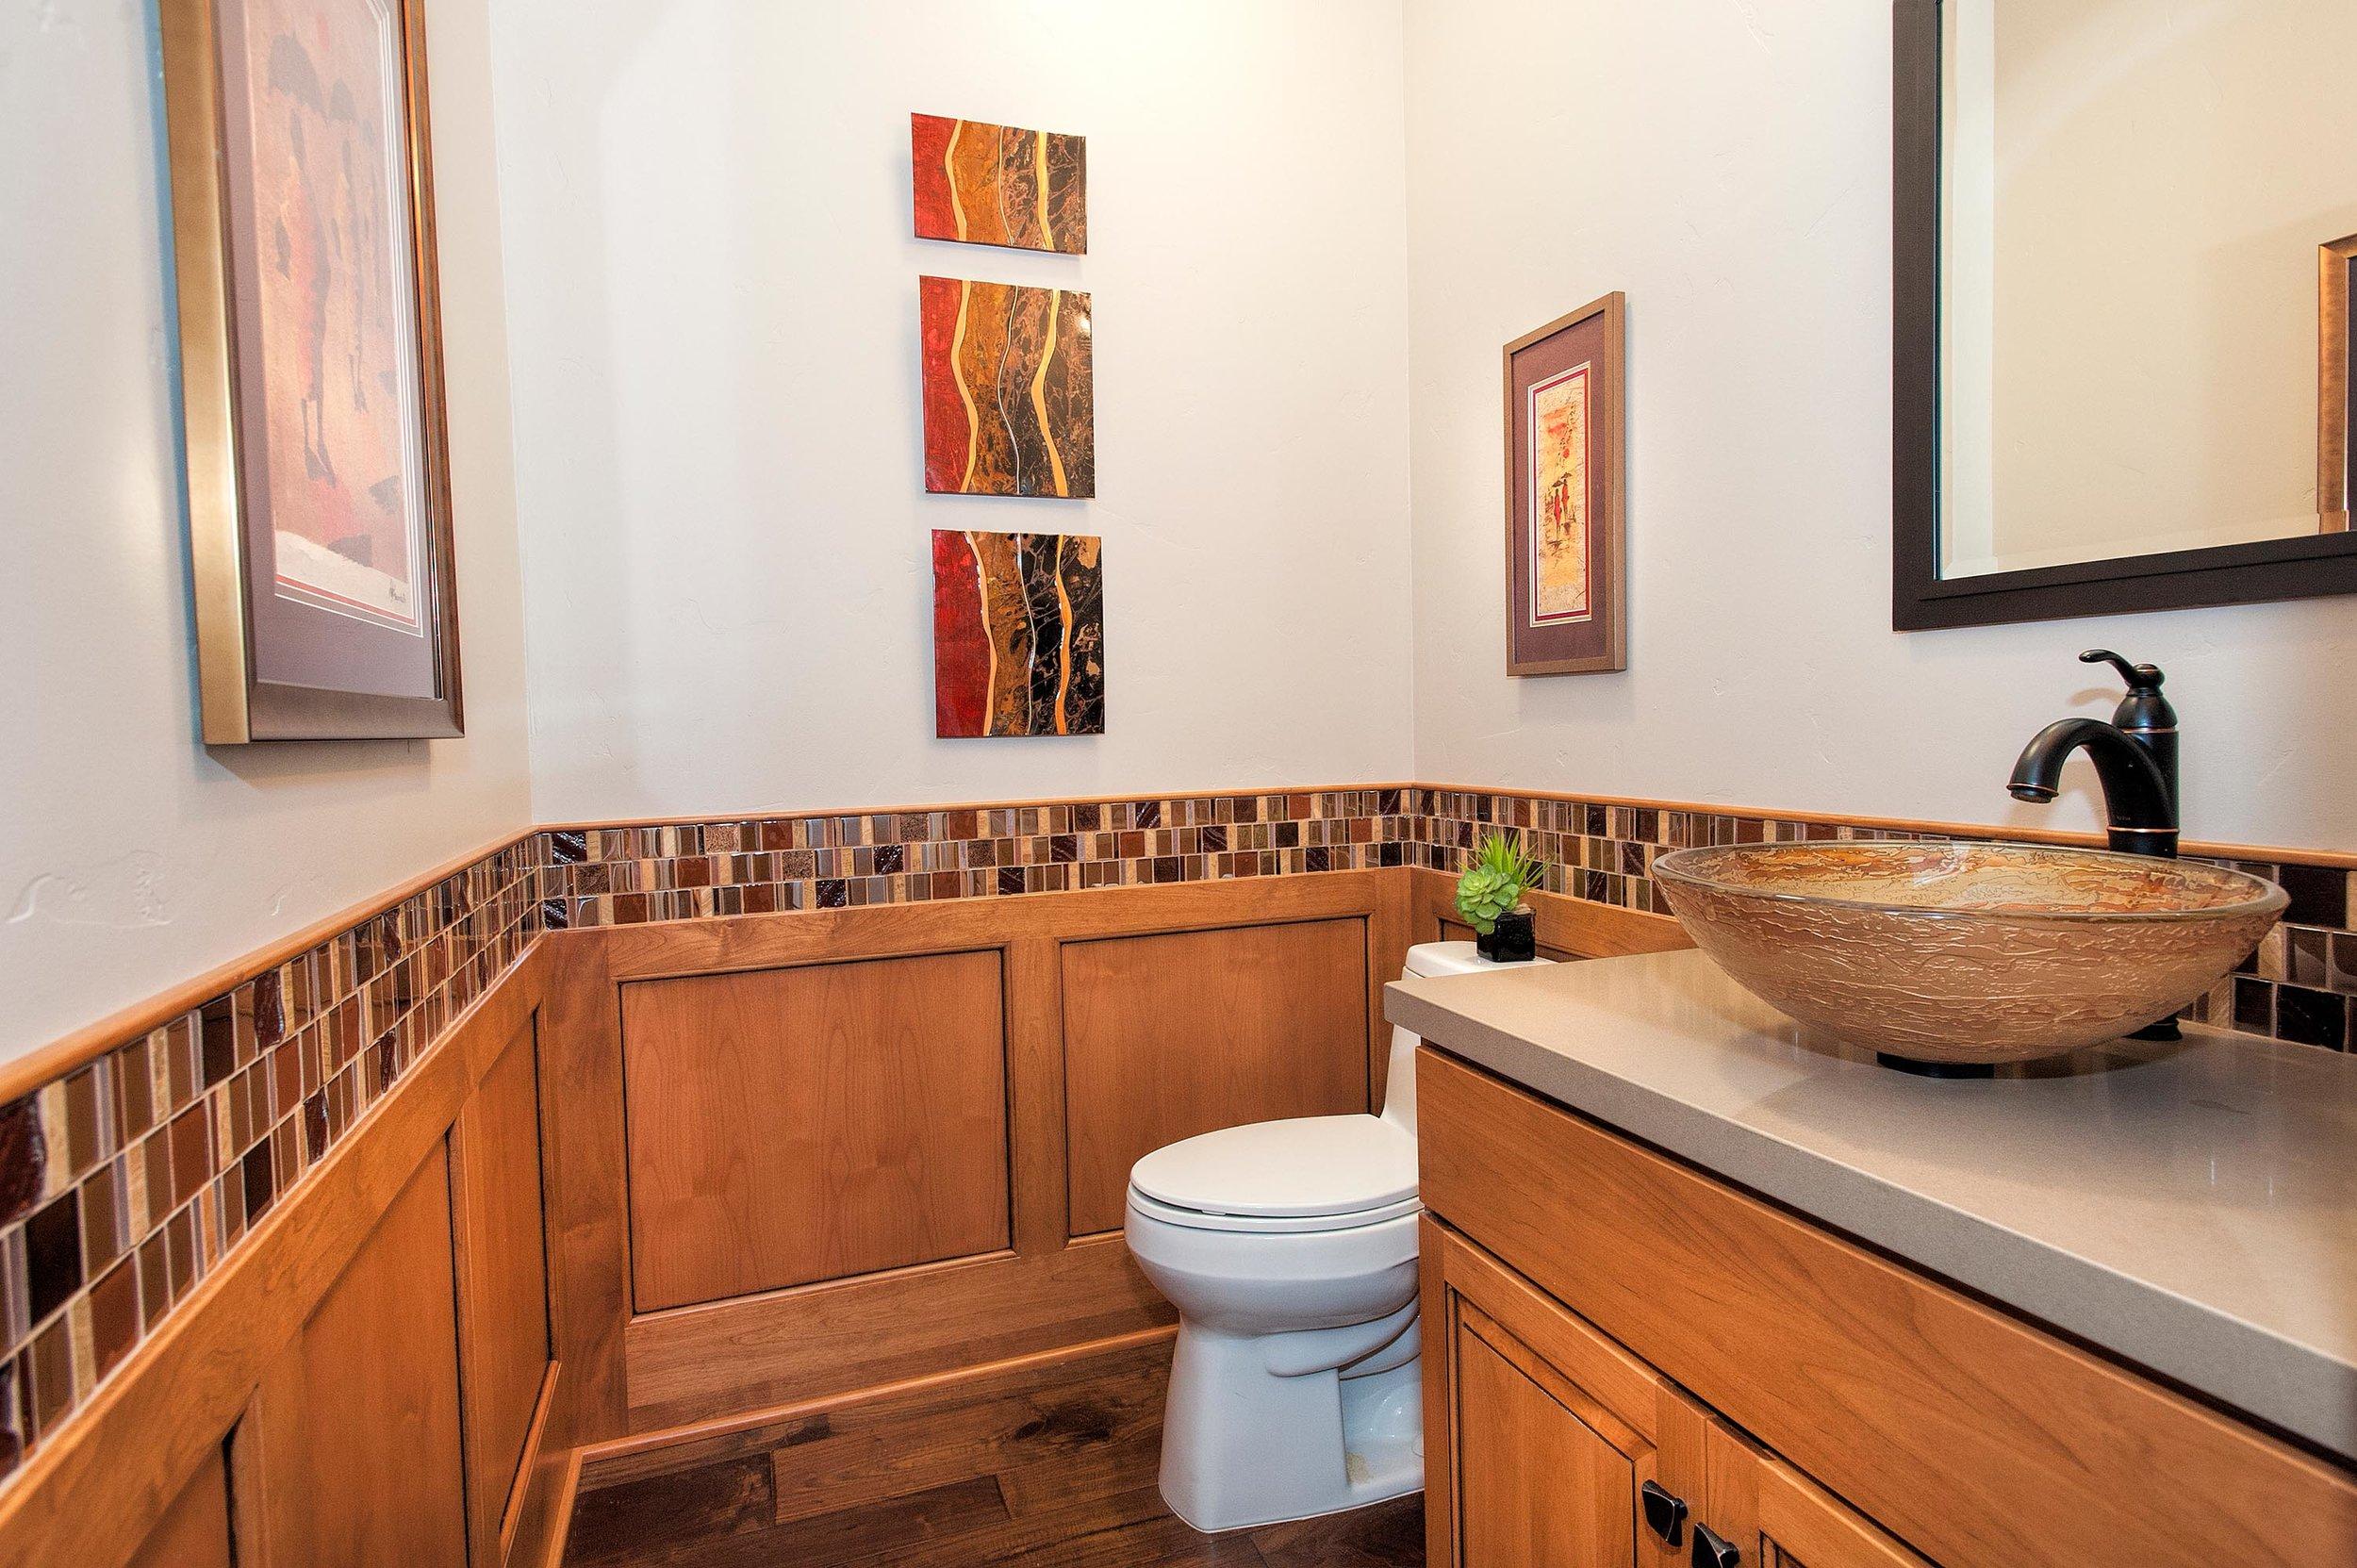 Elegant bathroom with wood look tile flooring, painting and cabinet